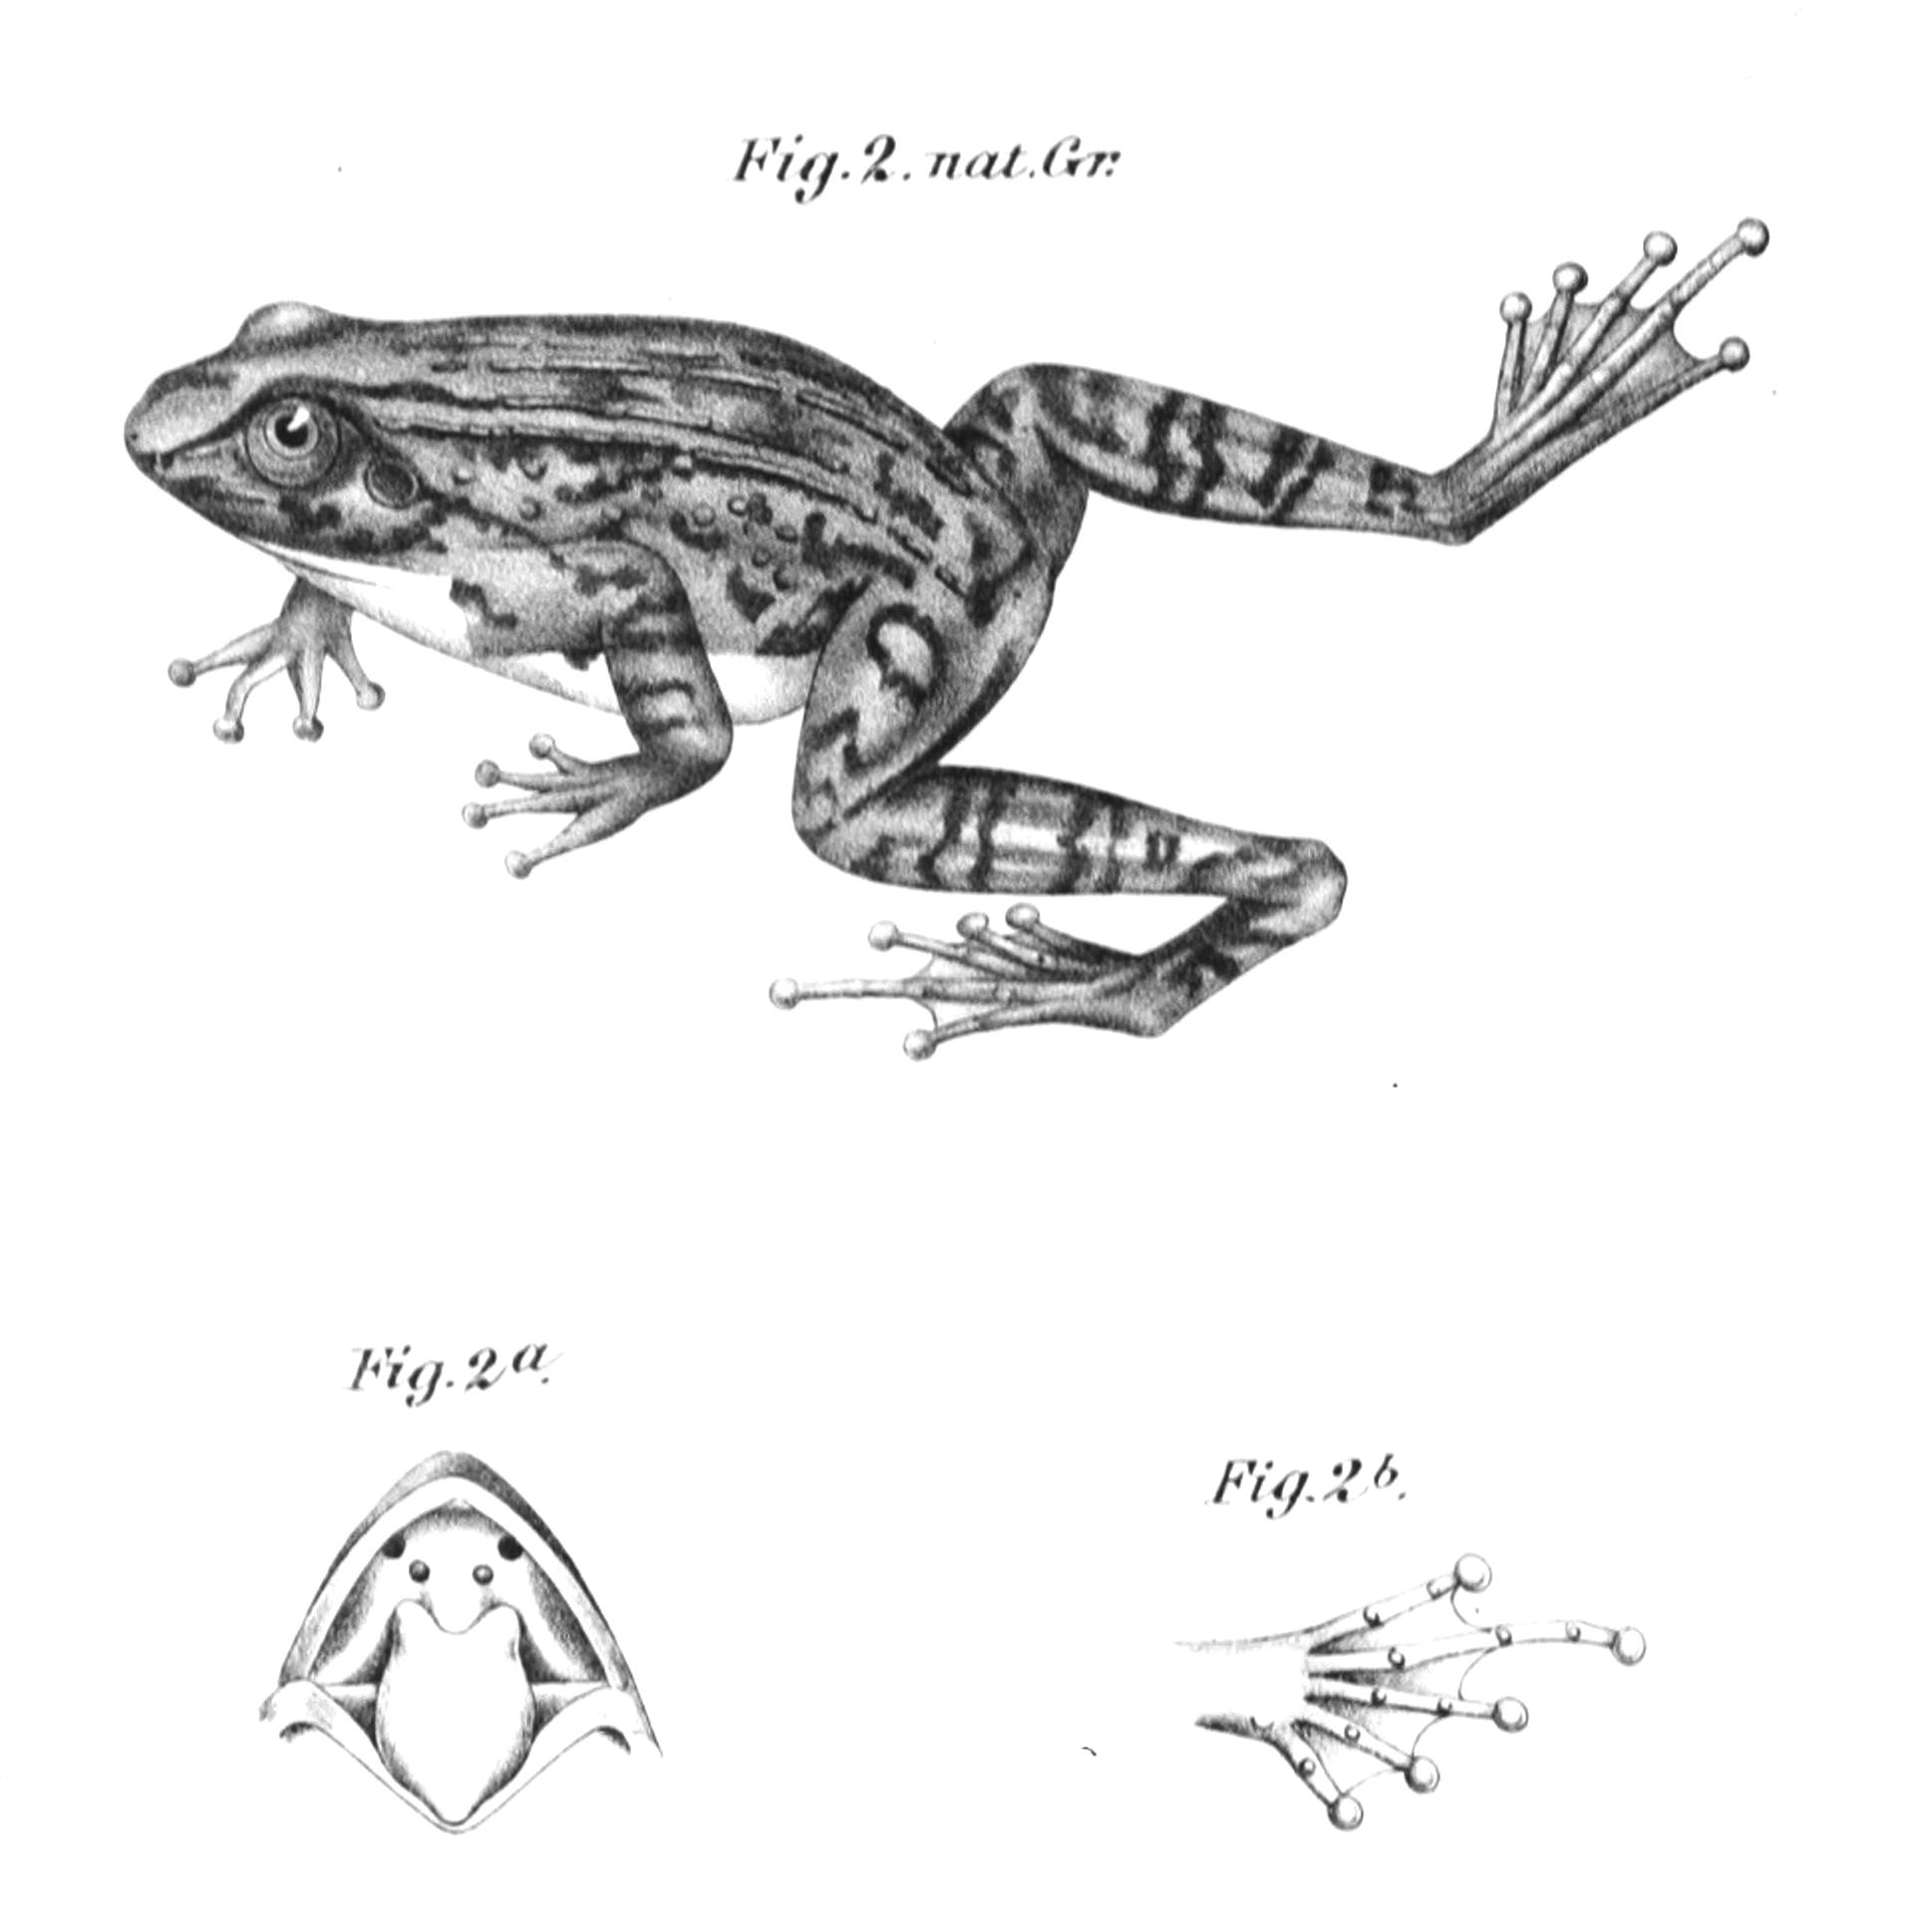 Depiction of Petropedetidae